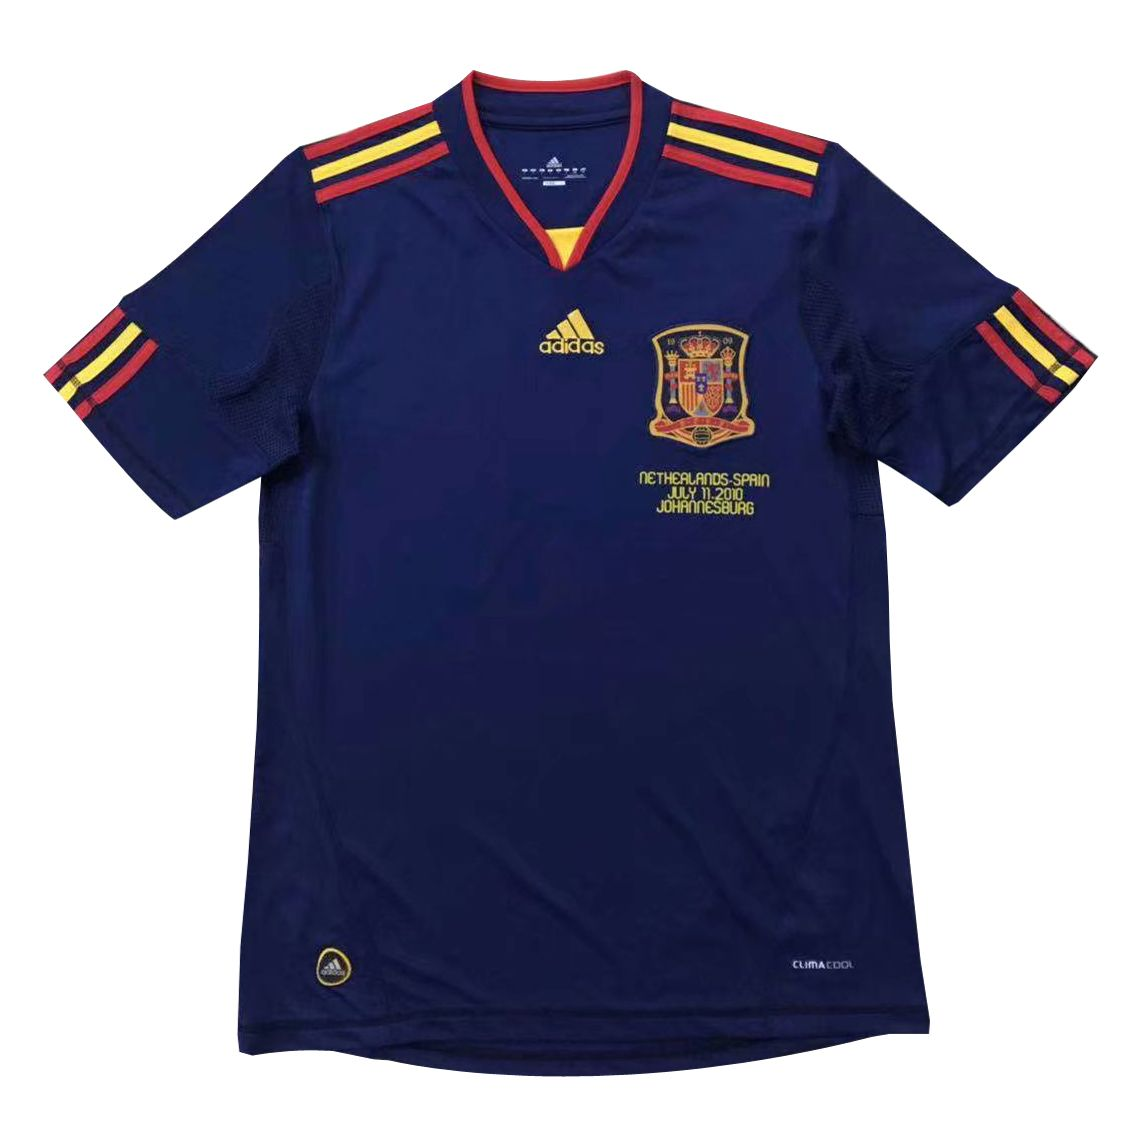 Spain 2010 Retro Away Soccer Jersey Shirt In 2020 Soccer Jersey Jersey Shirt Retro Football Shirts